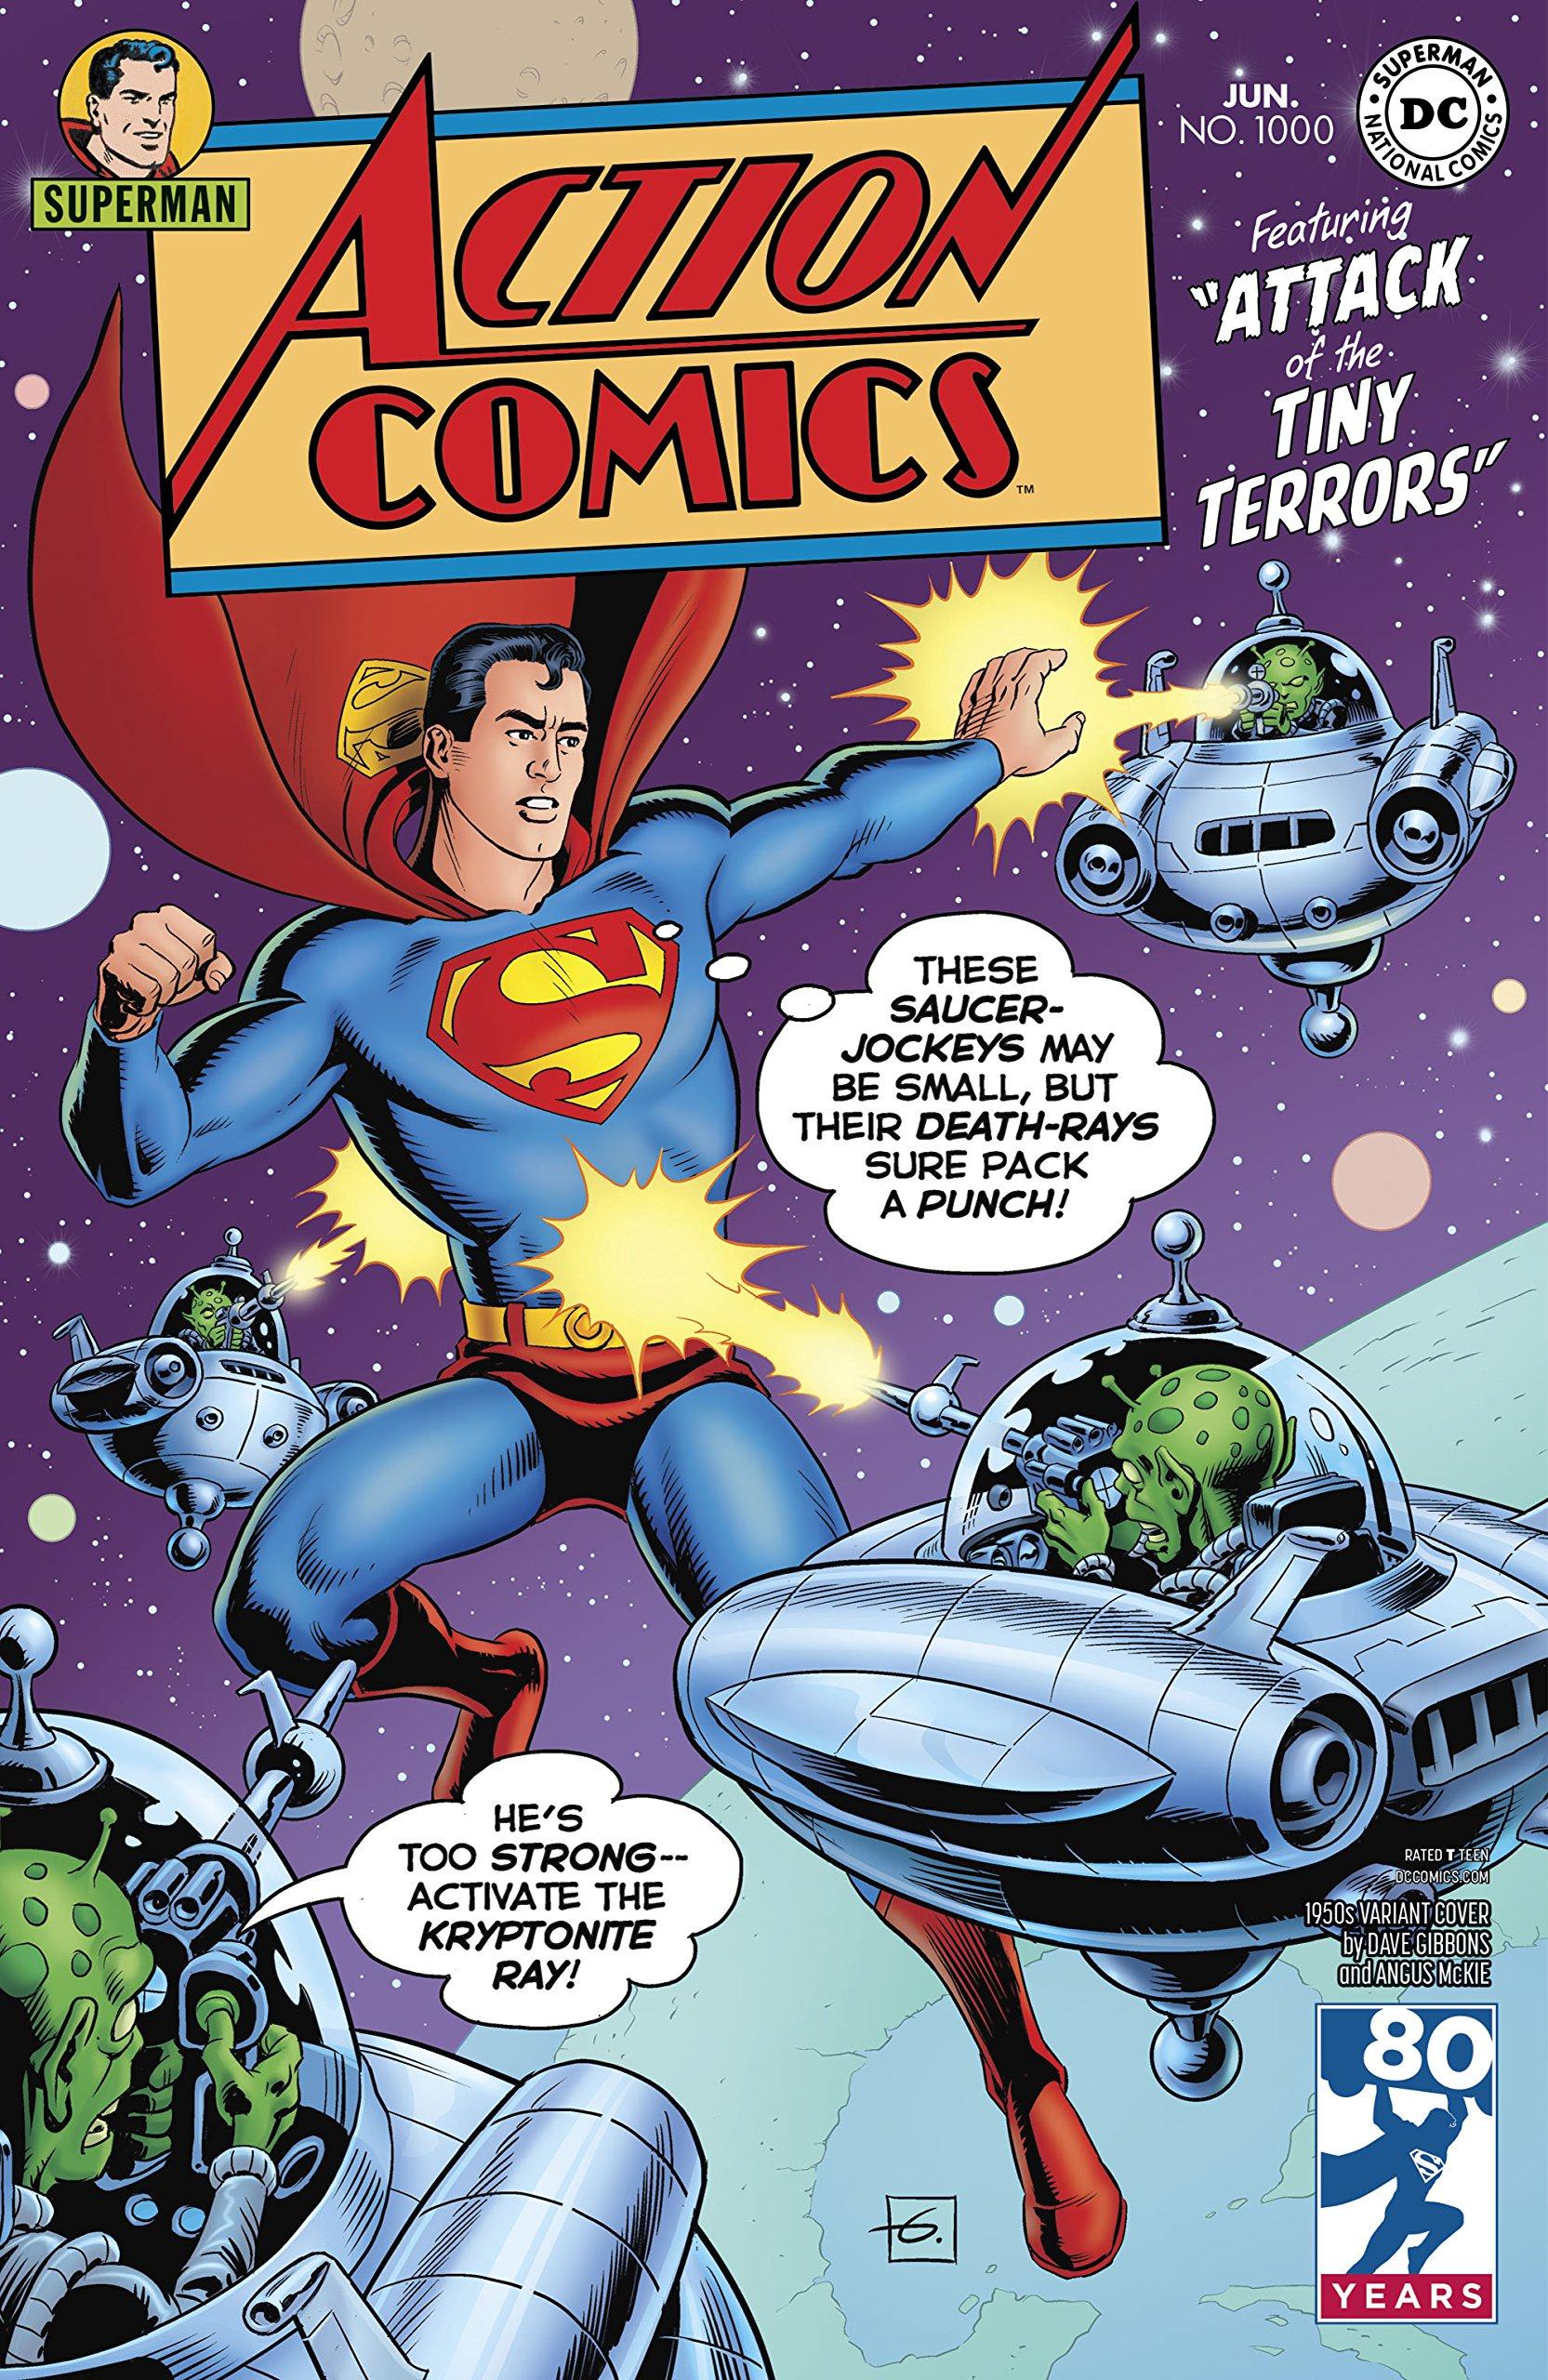 ACTION COMICS #1000 1950S VAR ebook